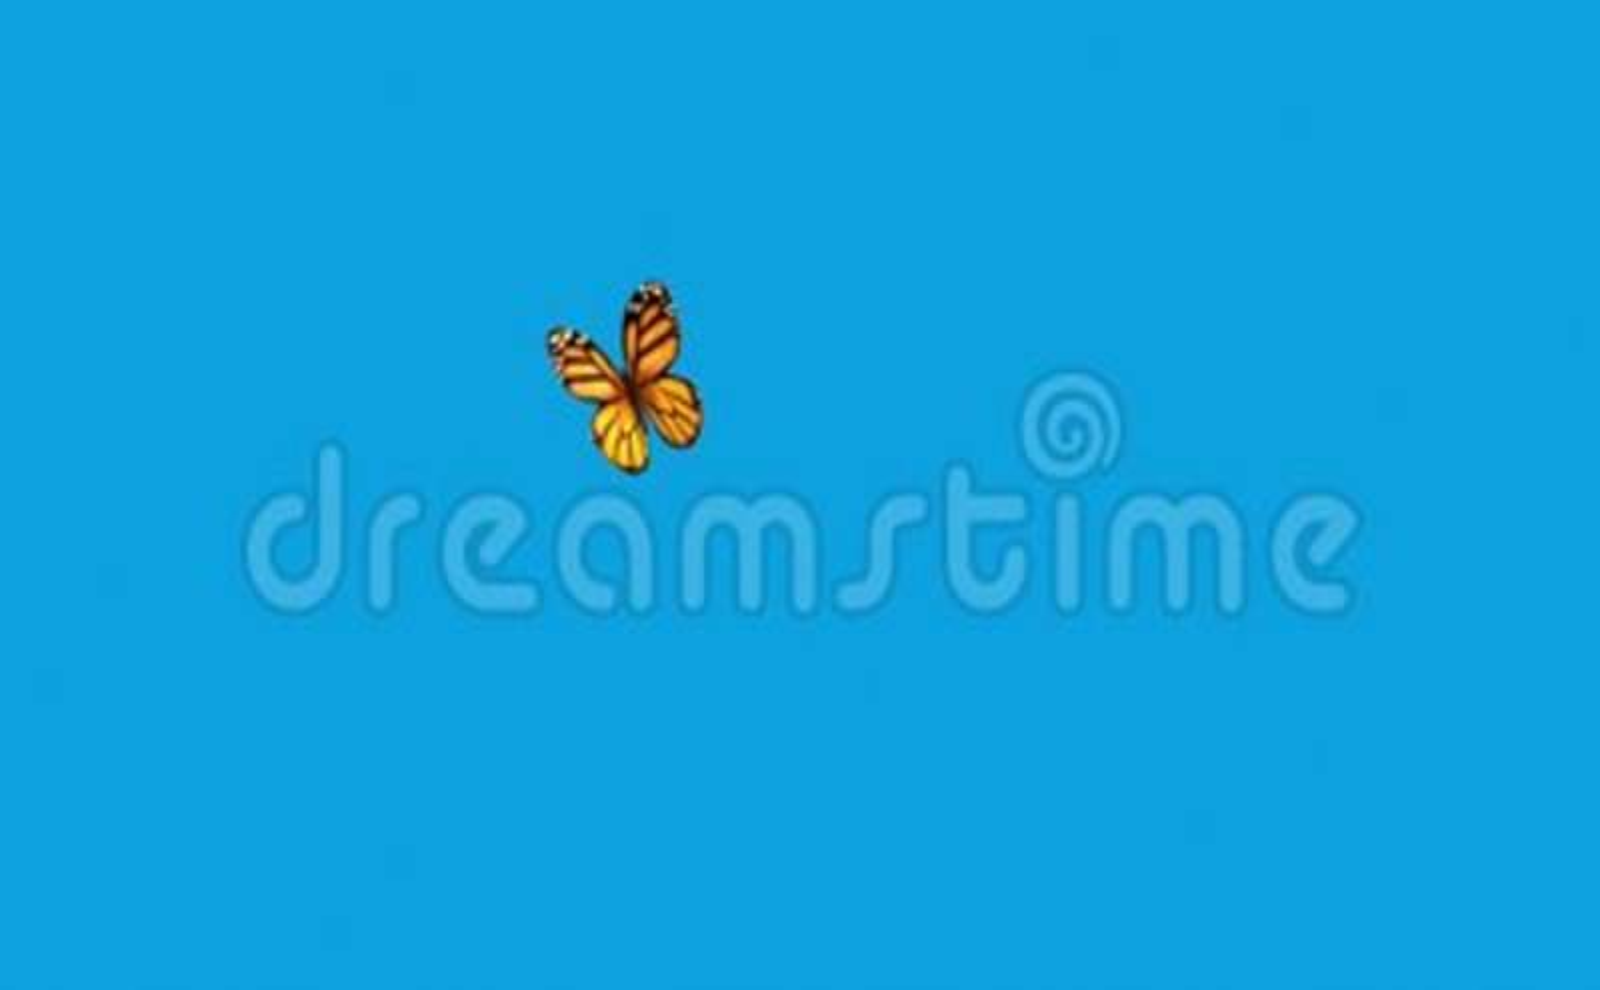 Orange Butterfly Flying on a Blue Background  3d animation  4K